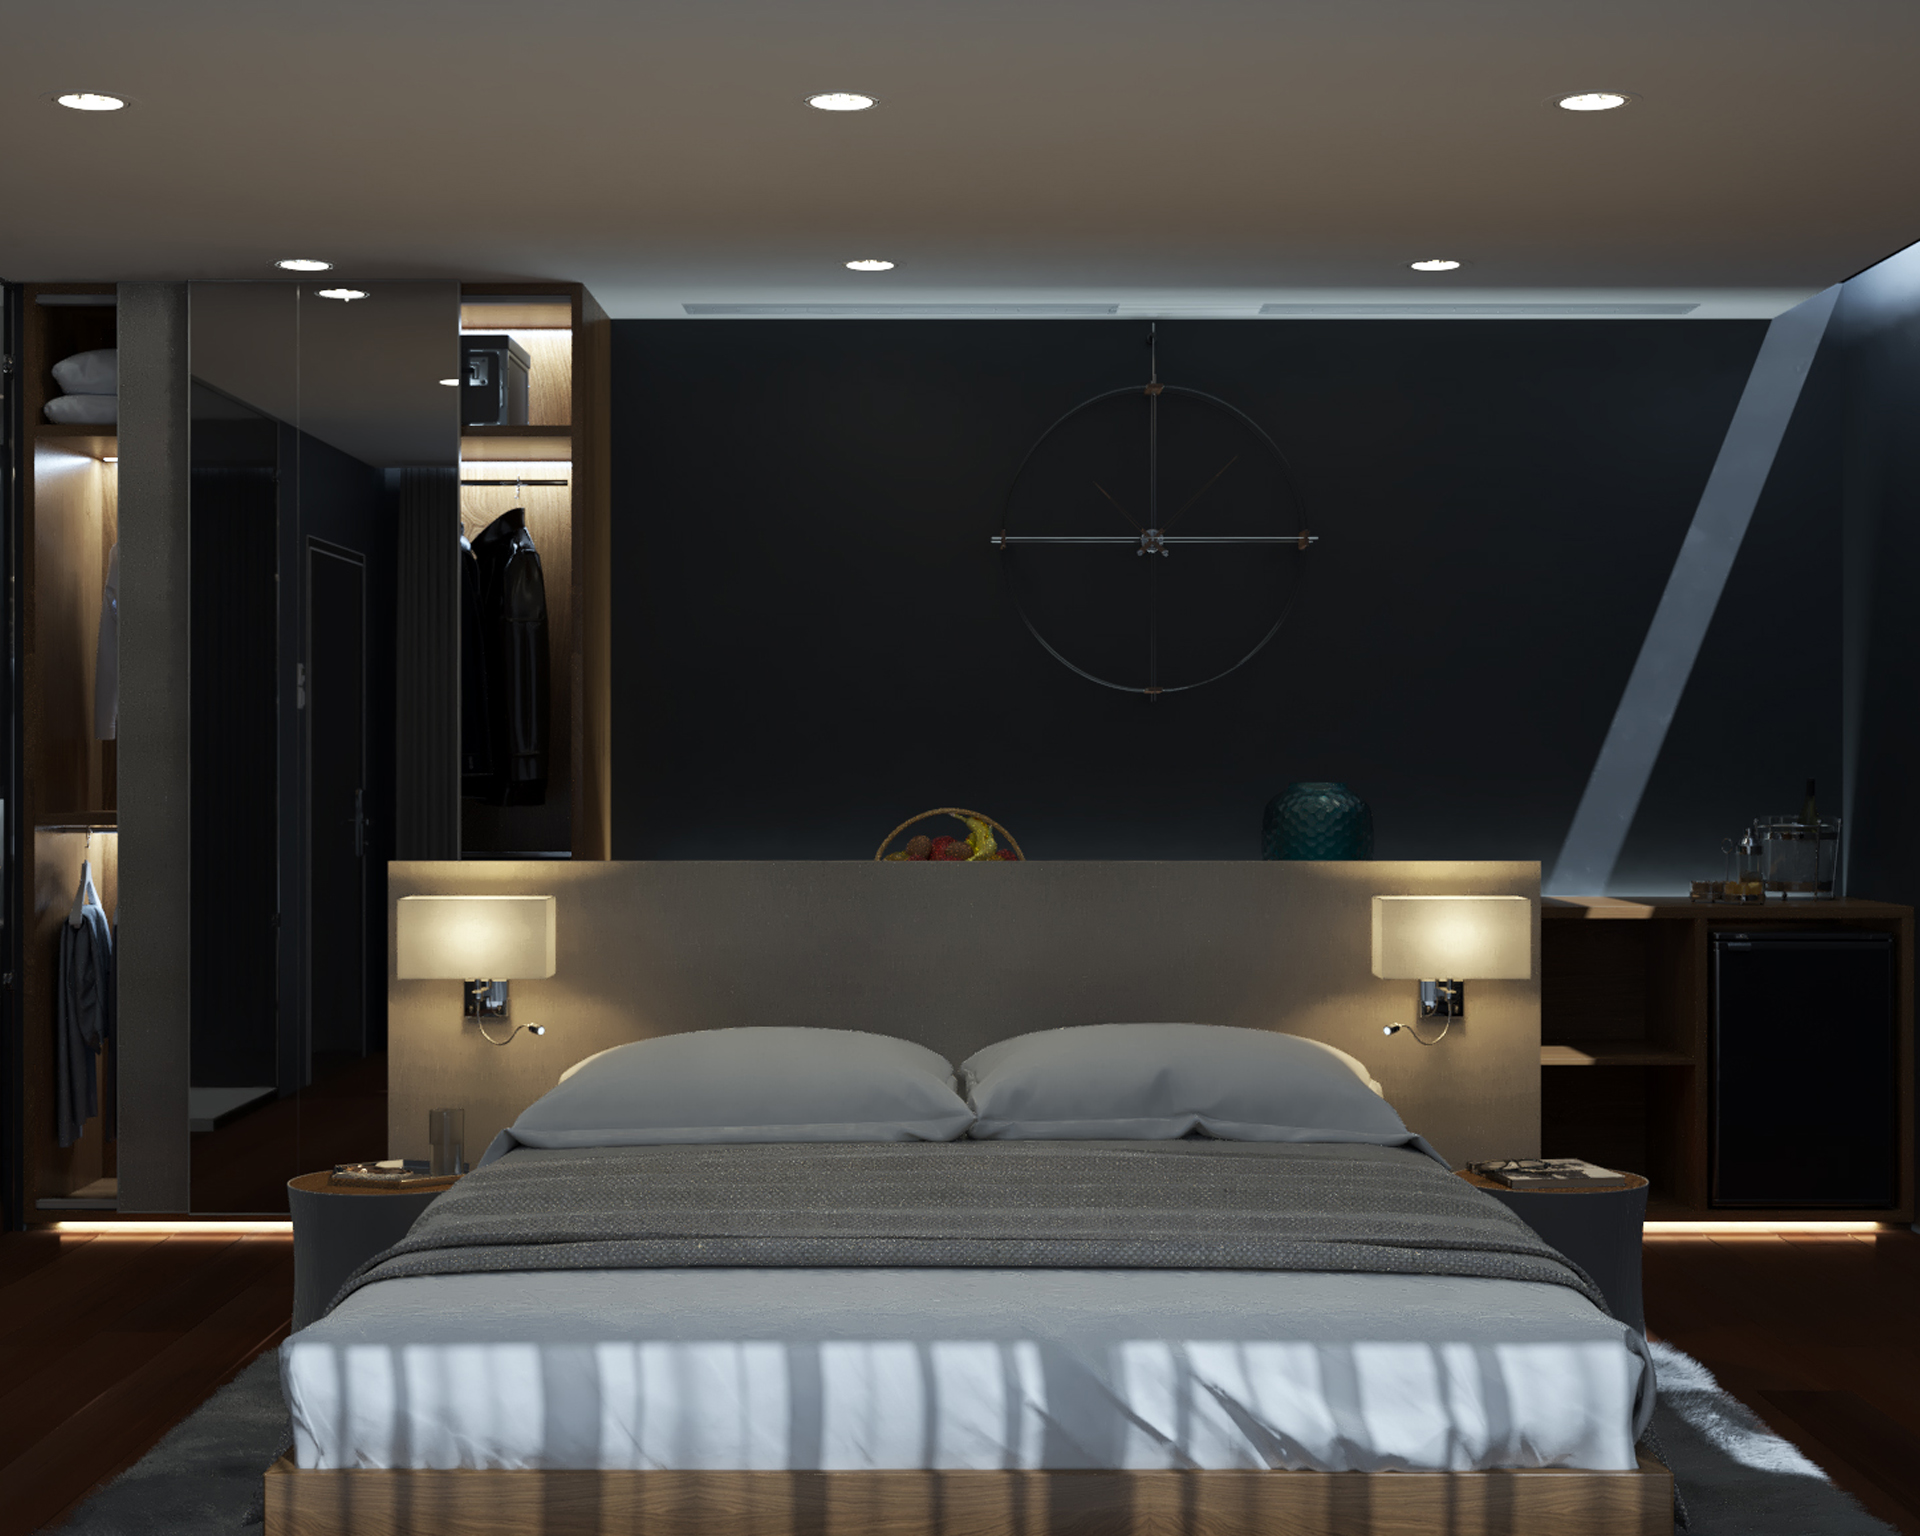 habitacion-hotel-madrid-alfonso-perez-alvarez